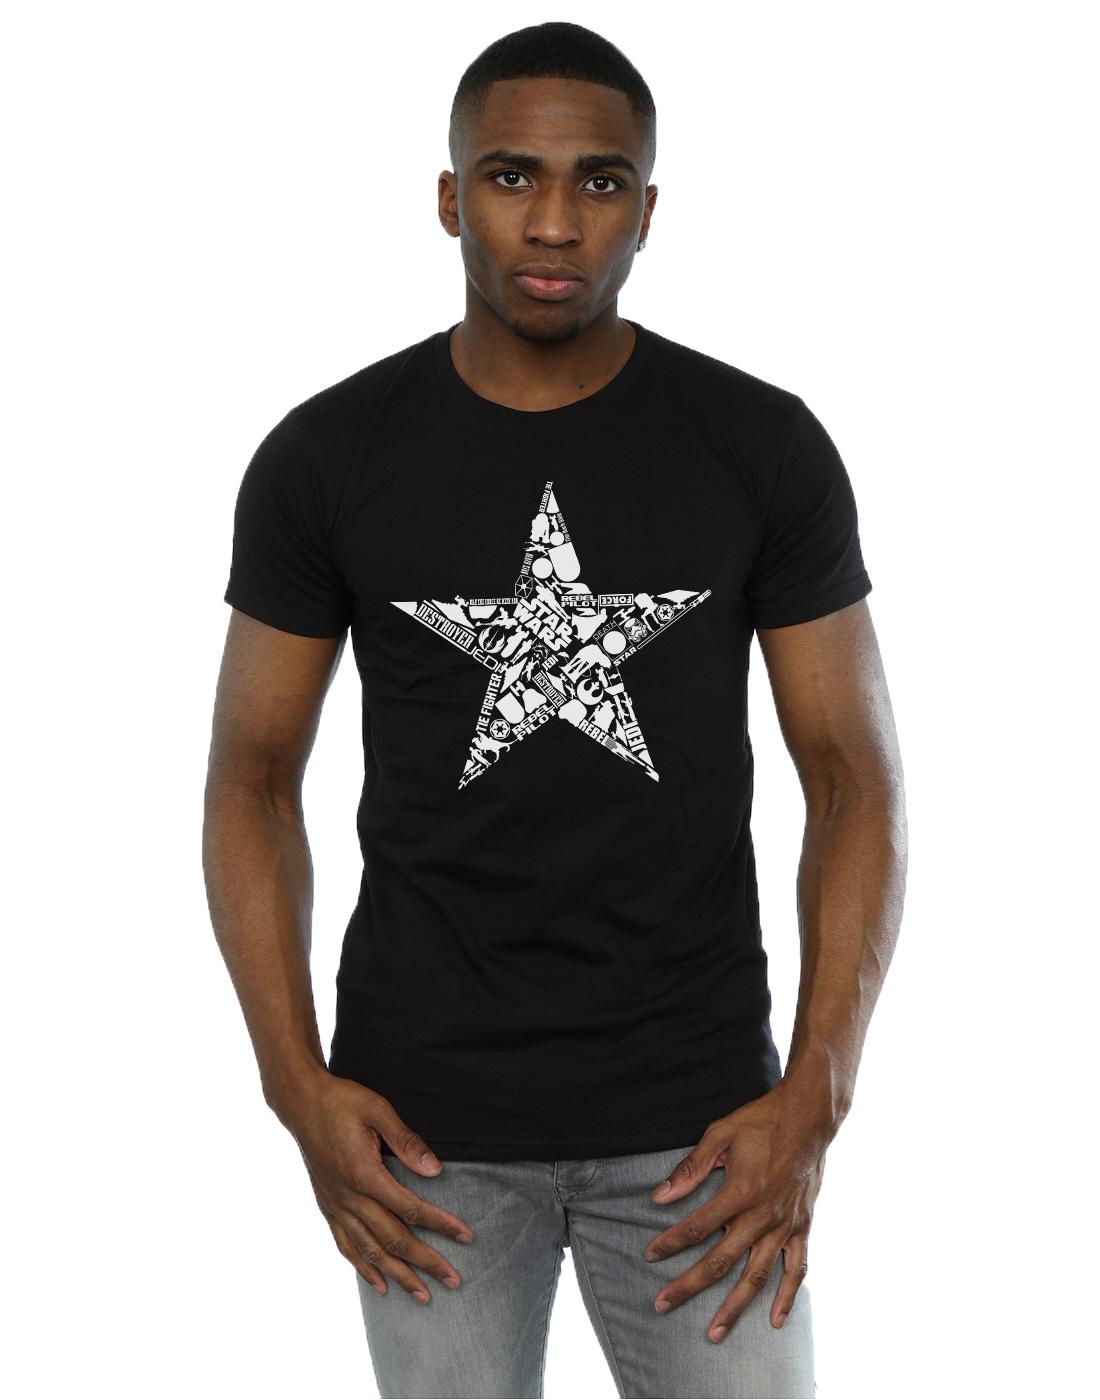 Star-Wars-T-Shirt-Mens-Official-Merchandise thumbnail 21